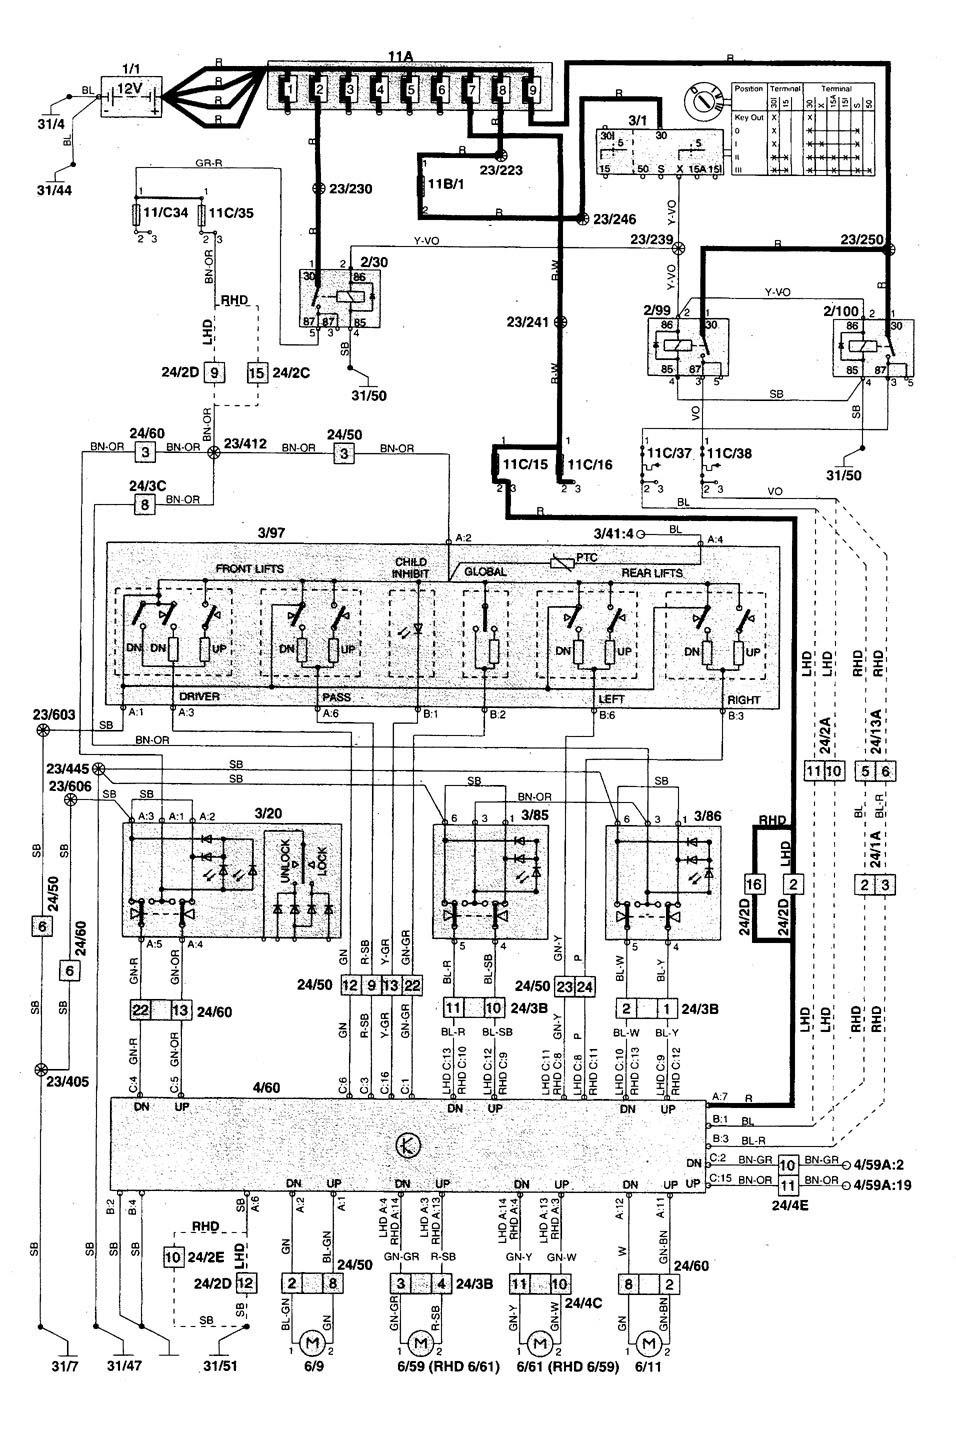 Diagram 2009 Volvo C70 Wiring Diagram Full Version Hd Quality Wiring Diagram Diagramsashaa Brunisport It